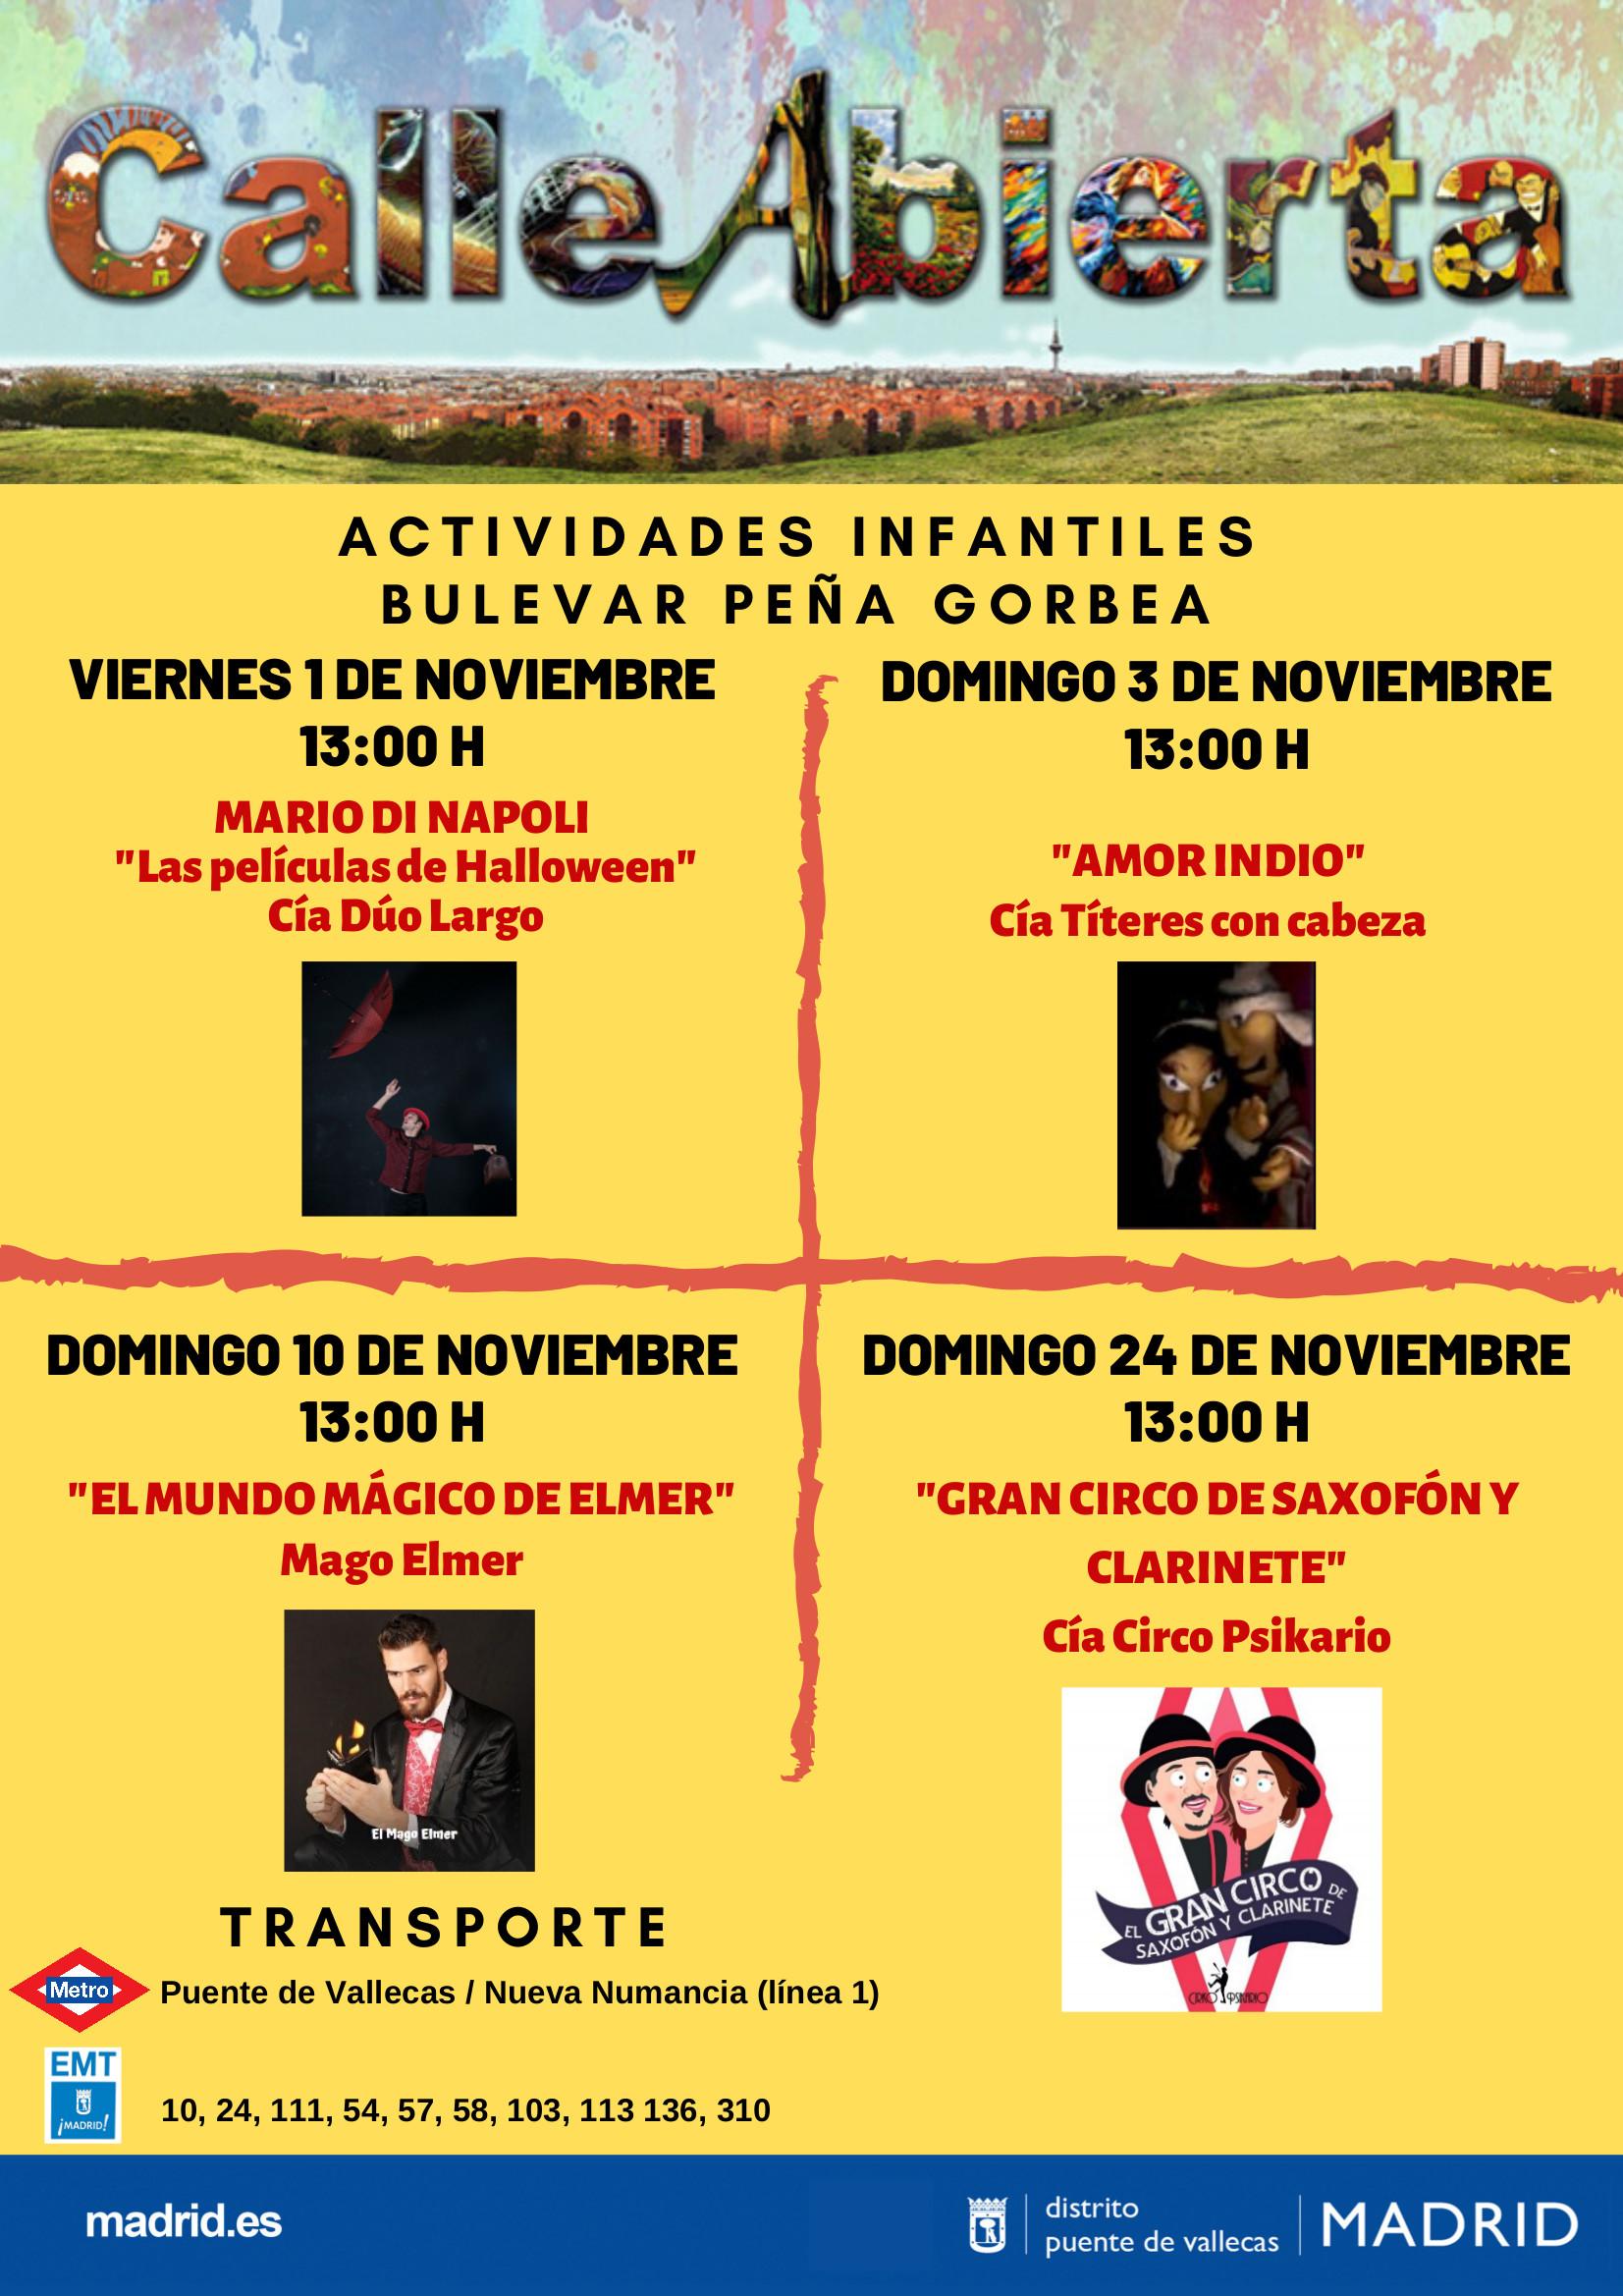 Noviembre - Calle Abierta Infantil - Bulevar de Peña Gorbea Vallecas